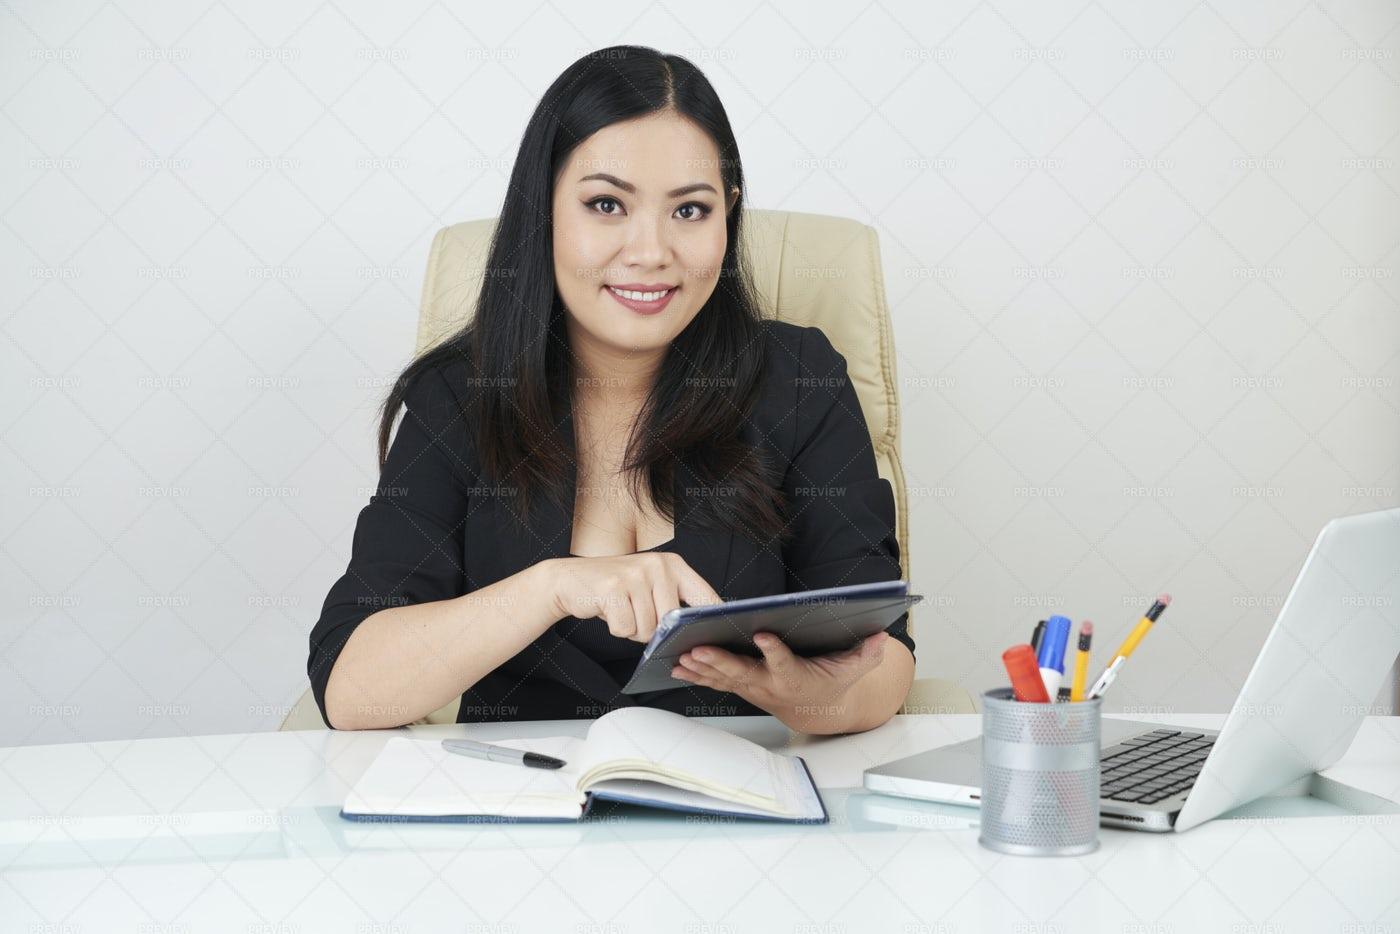 Businesswoman Working Online: Stock Photos